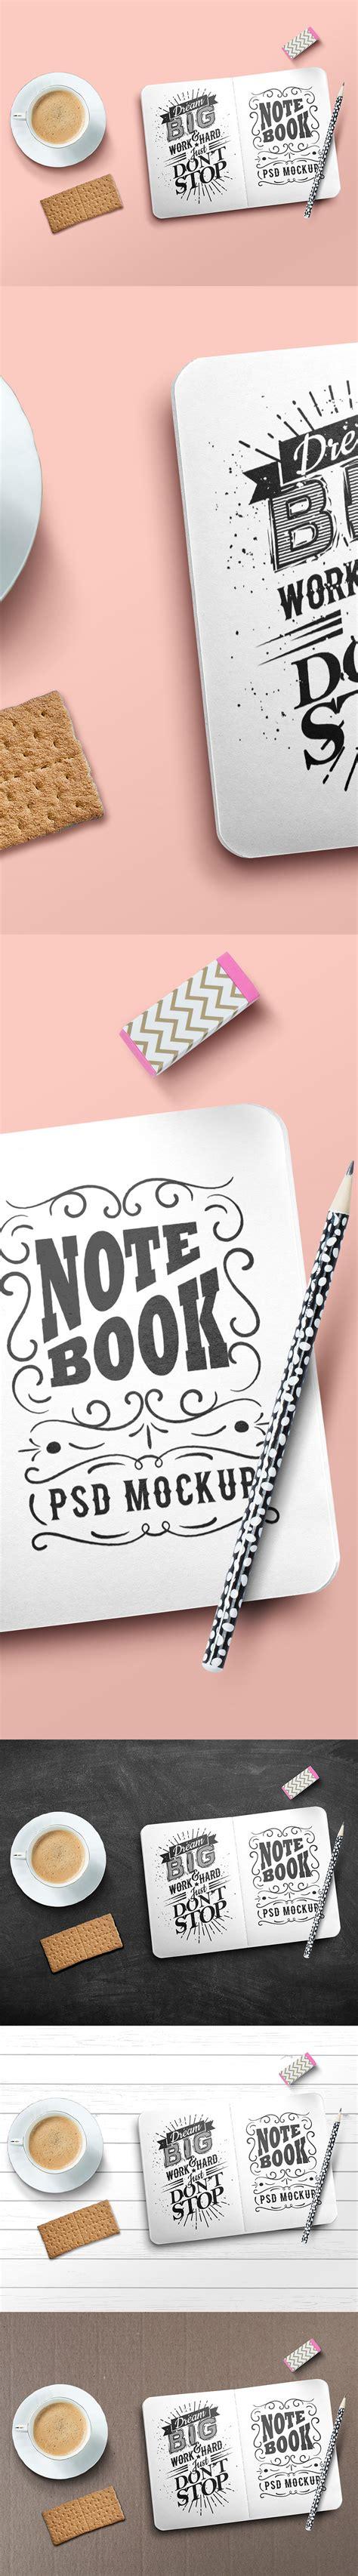 sketchbook mockup psd sketchbook mockup psd graphicsfuel